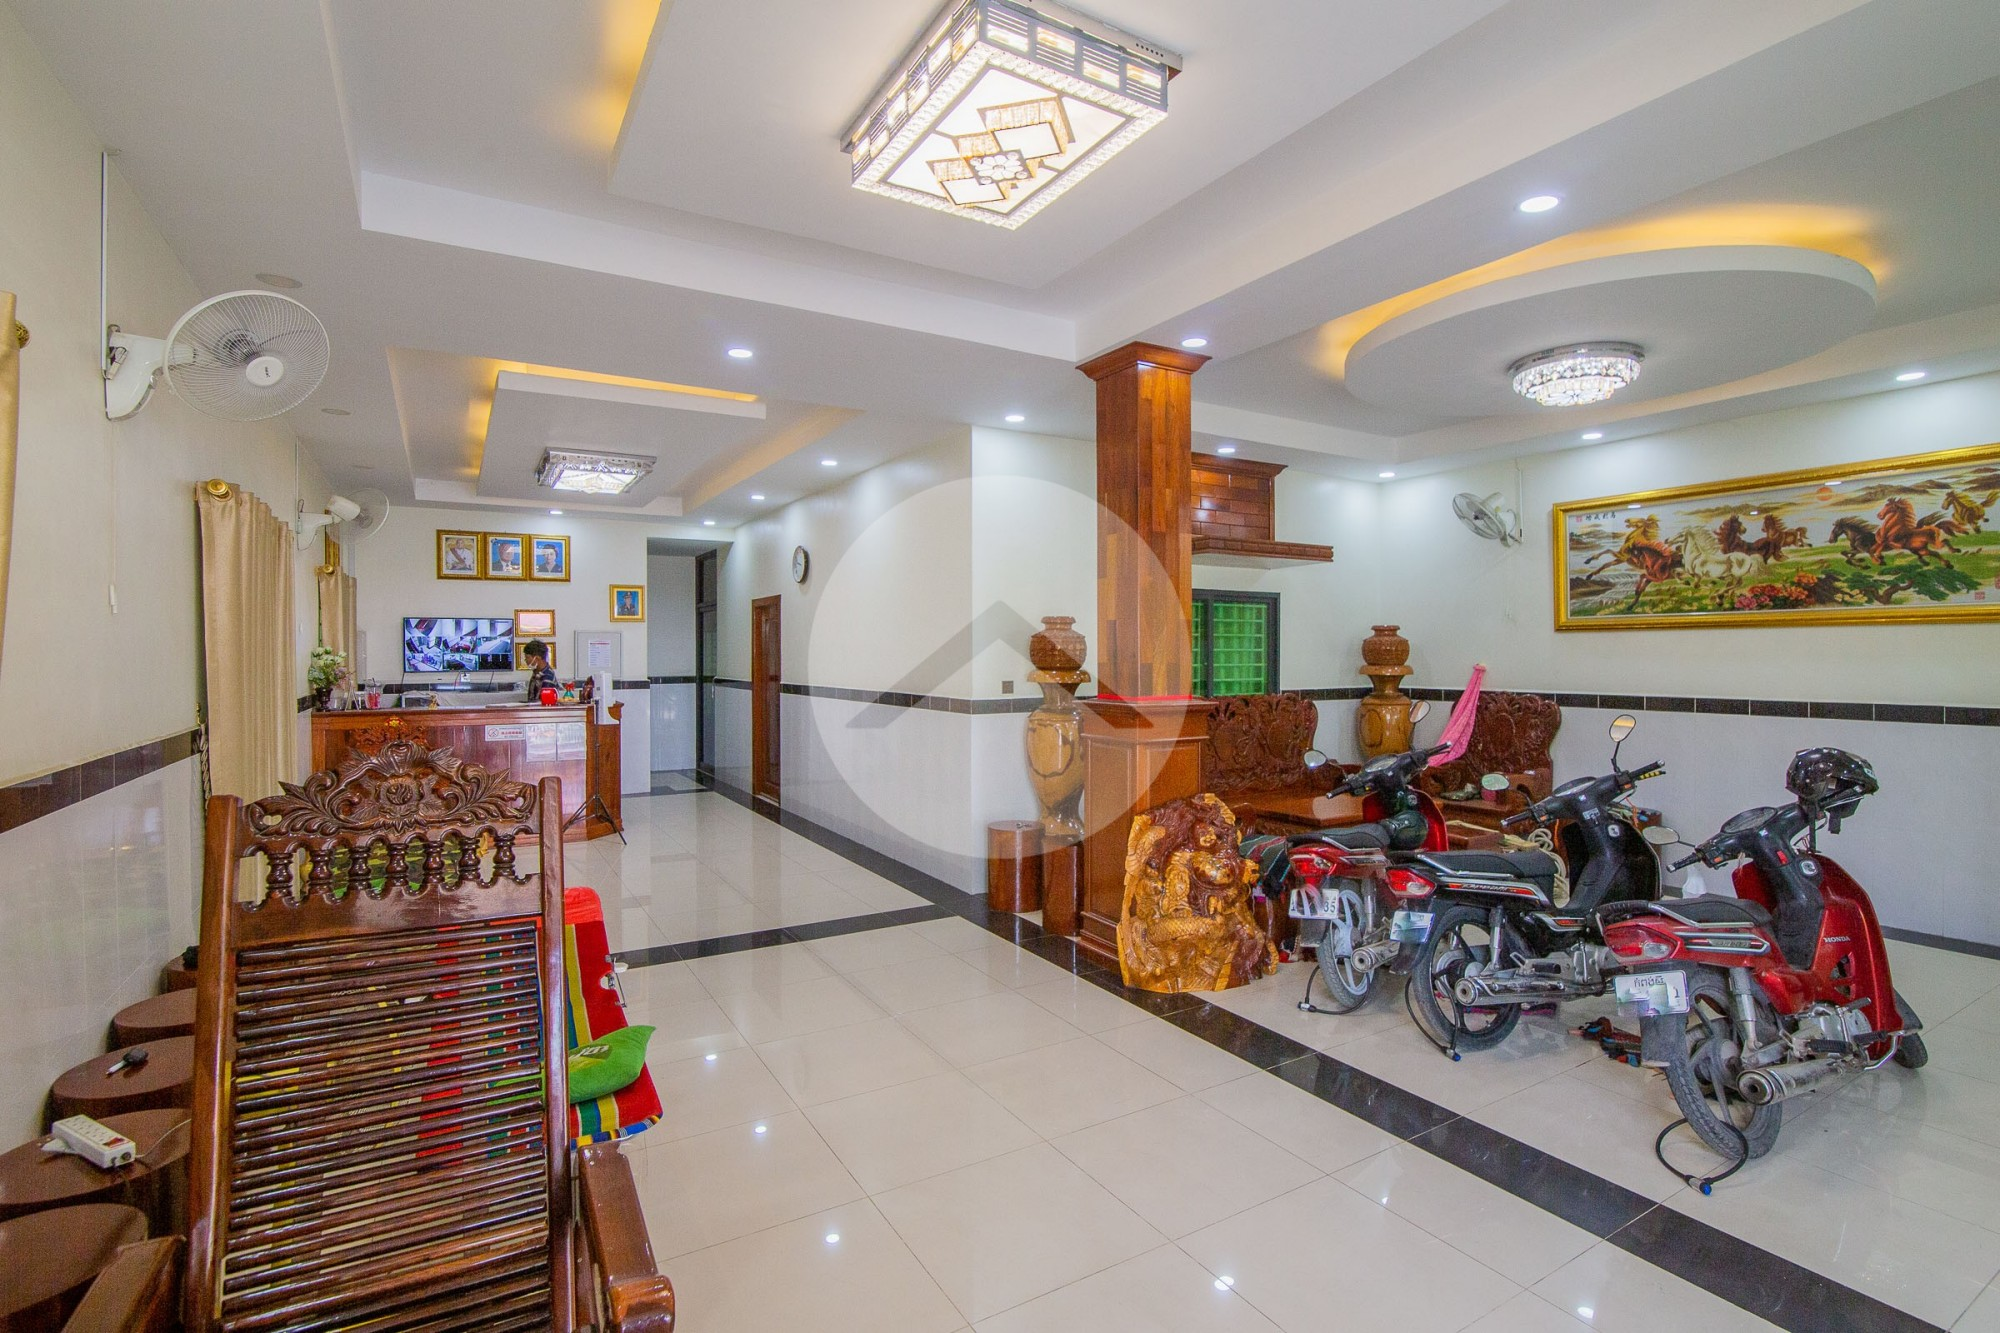 17 Bedroom Guesthouse For Rent - Teak Thla, Phnom Penh